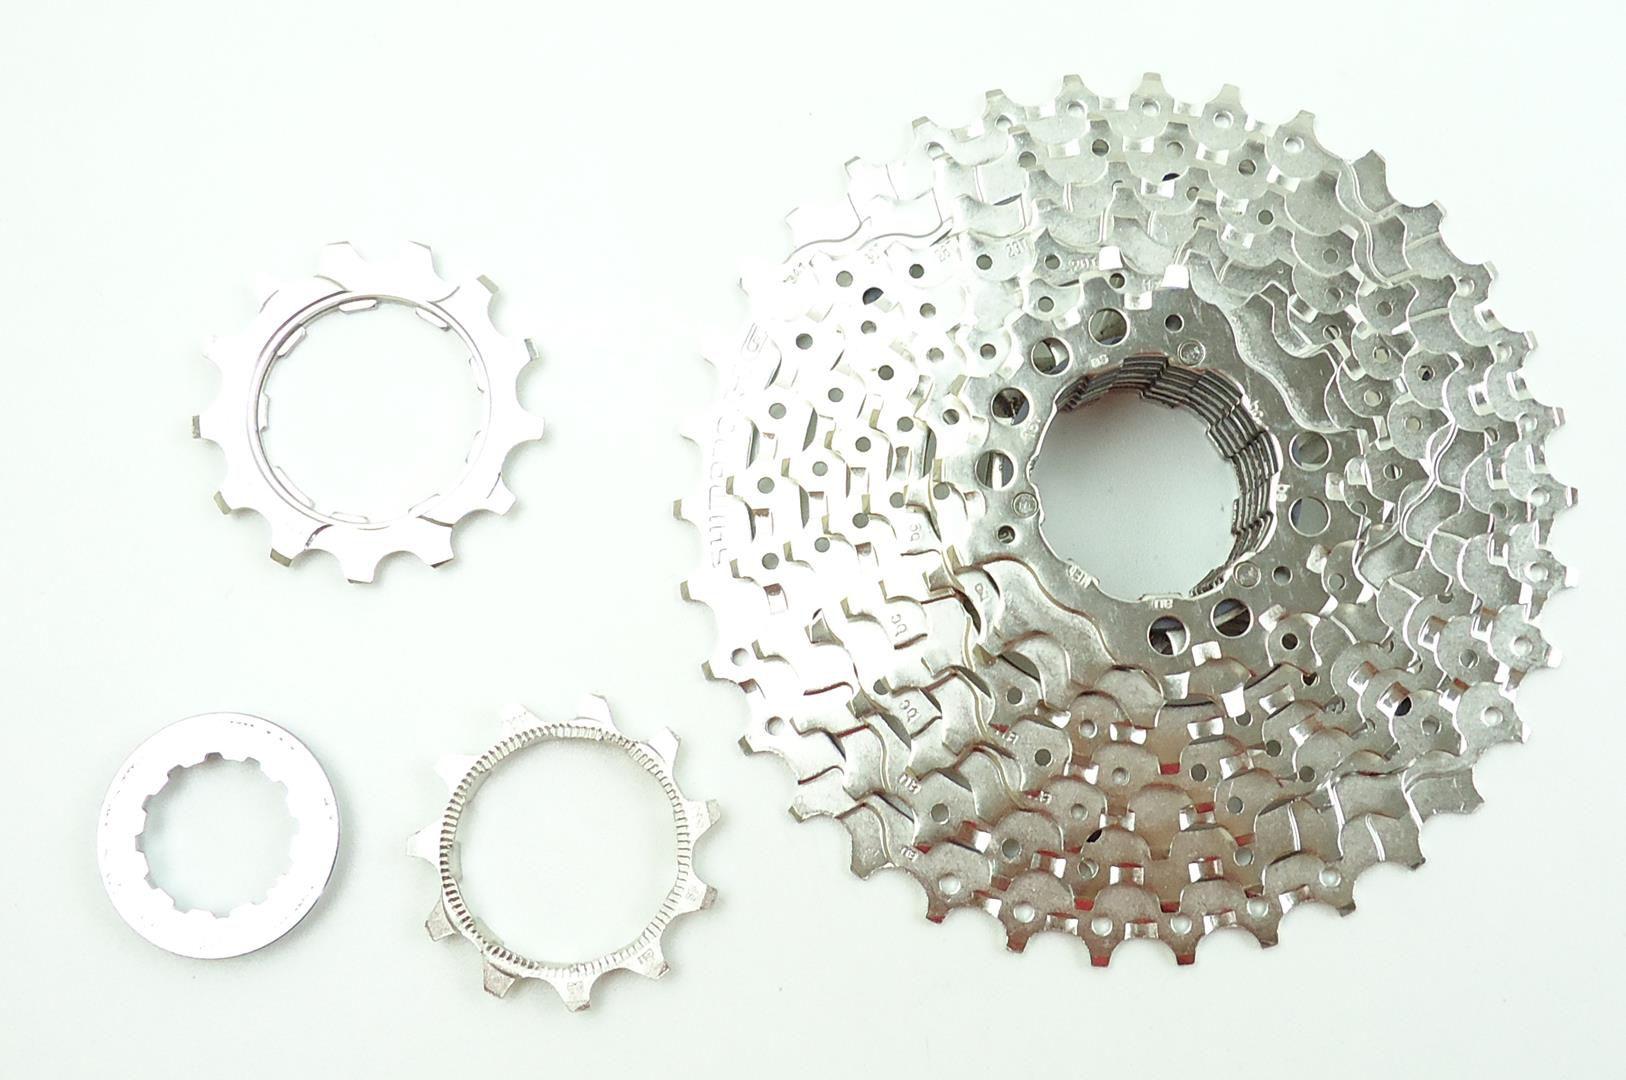 Cassete Bicicleta Shimano Alivio Hg400-9 11-34 dentes 27 Velocidades